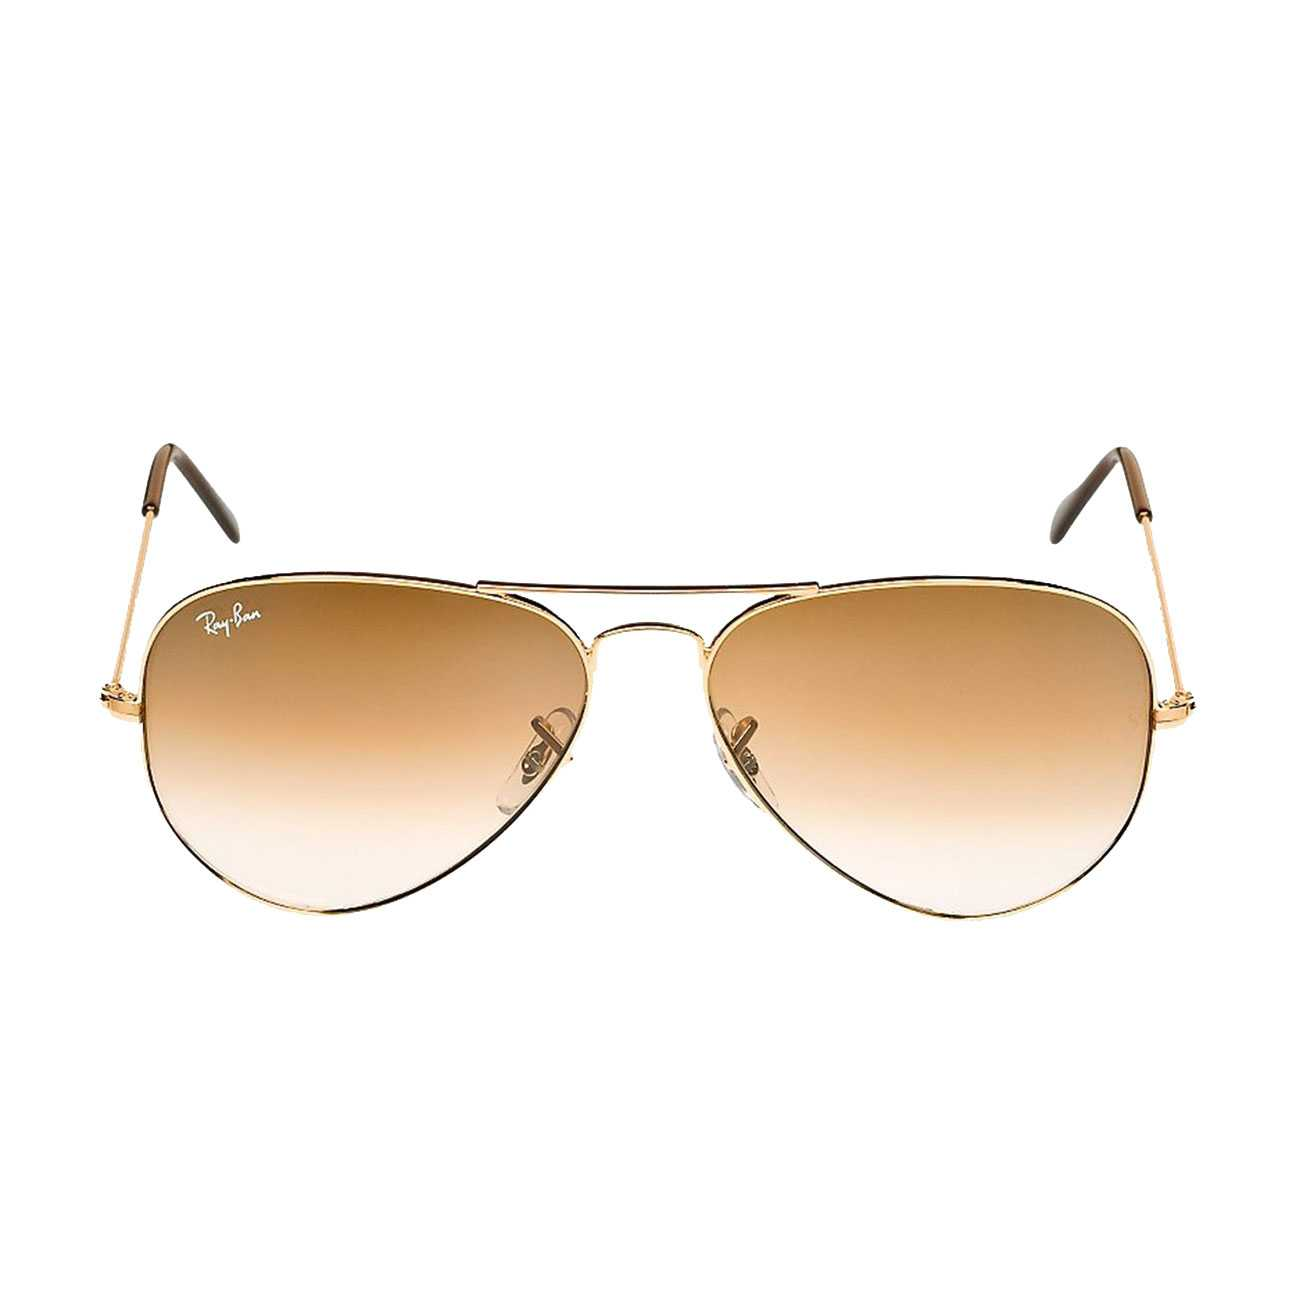 5239b4ce32 ... large metal italy sunglasses rb3025 977eb 92d67  top quality ochelari  de soare ray ban aviator rb3025 001 51 e50a6 62f39